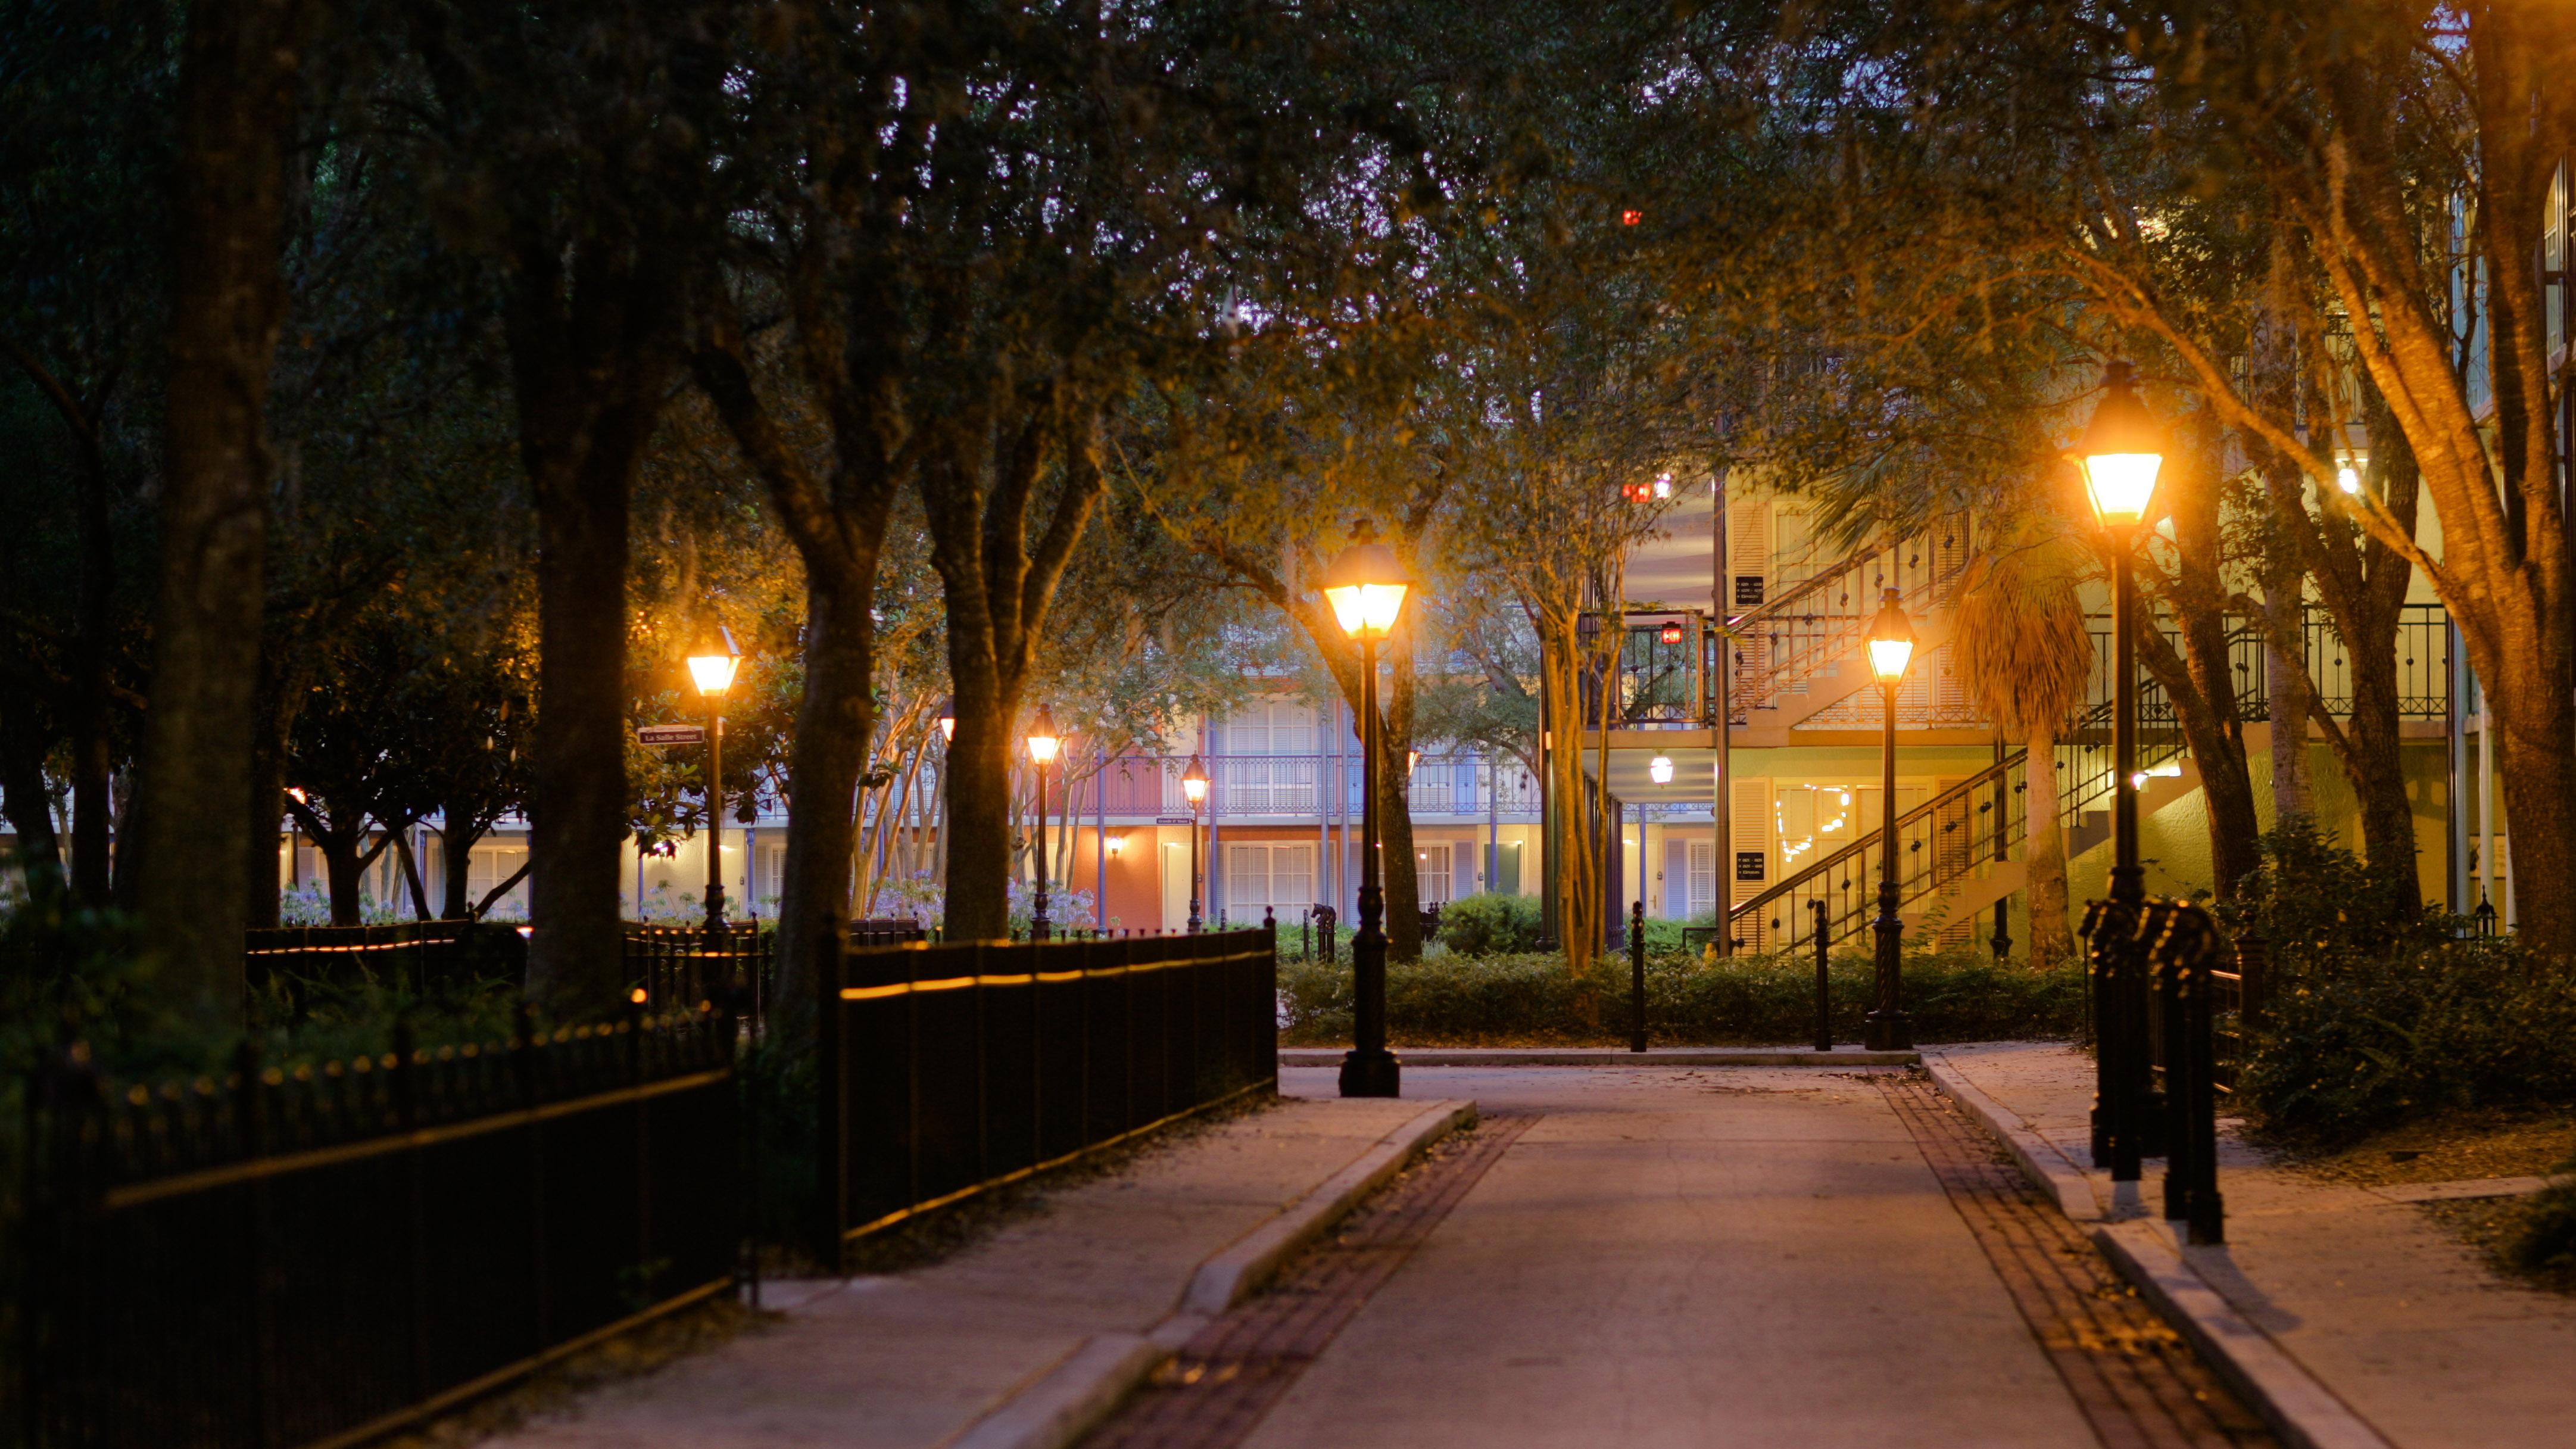 PO_French_Quarter_nightwalkway